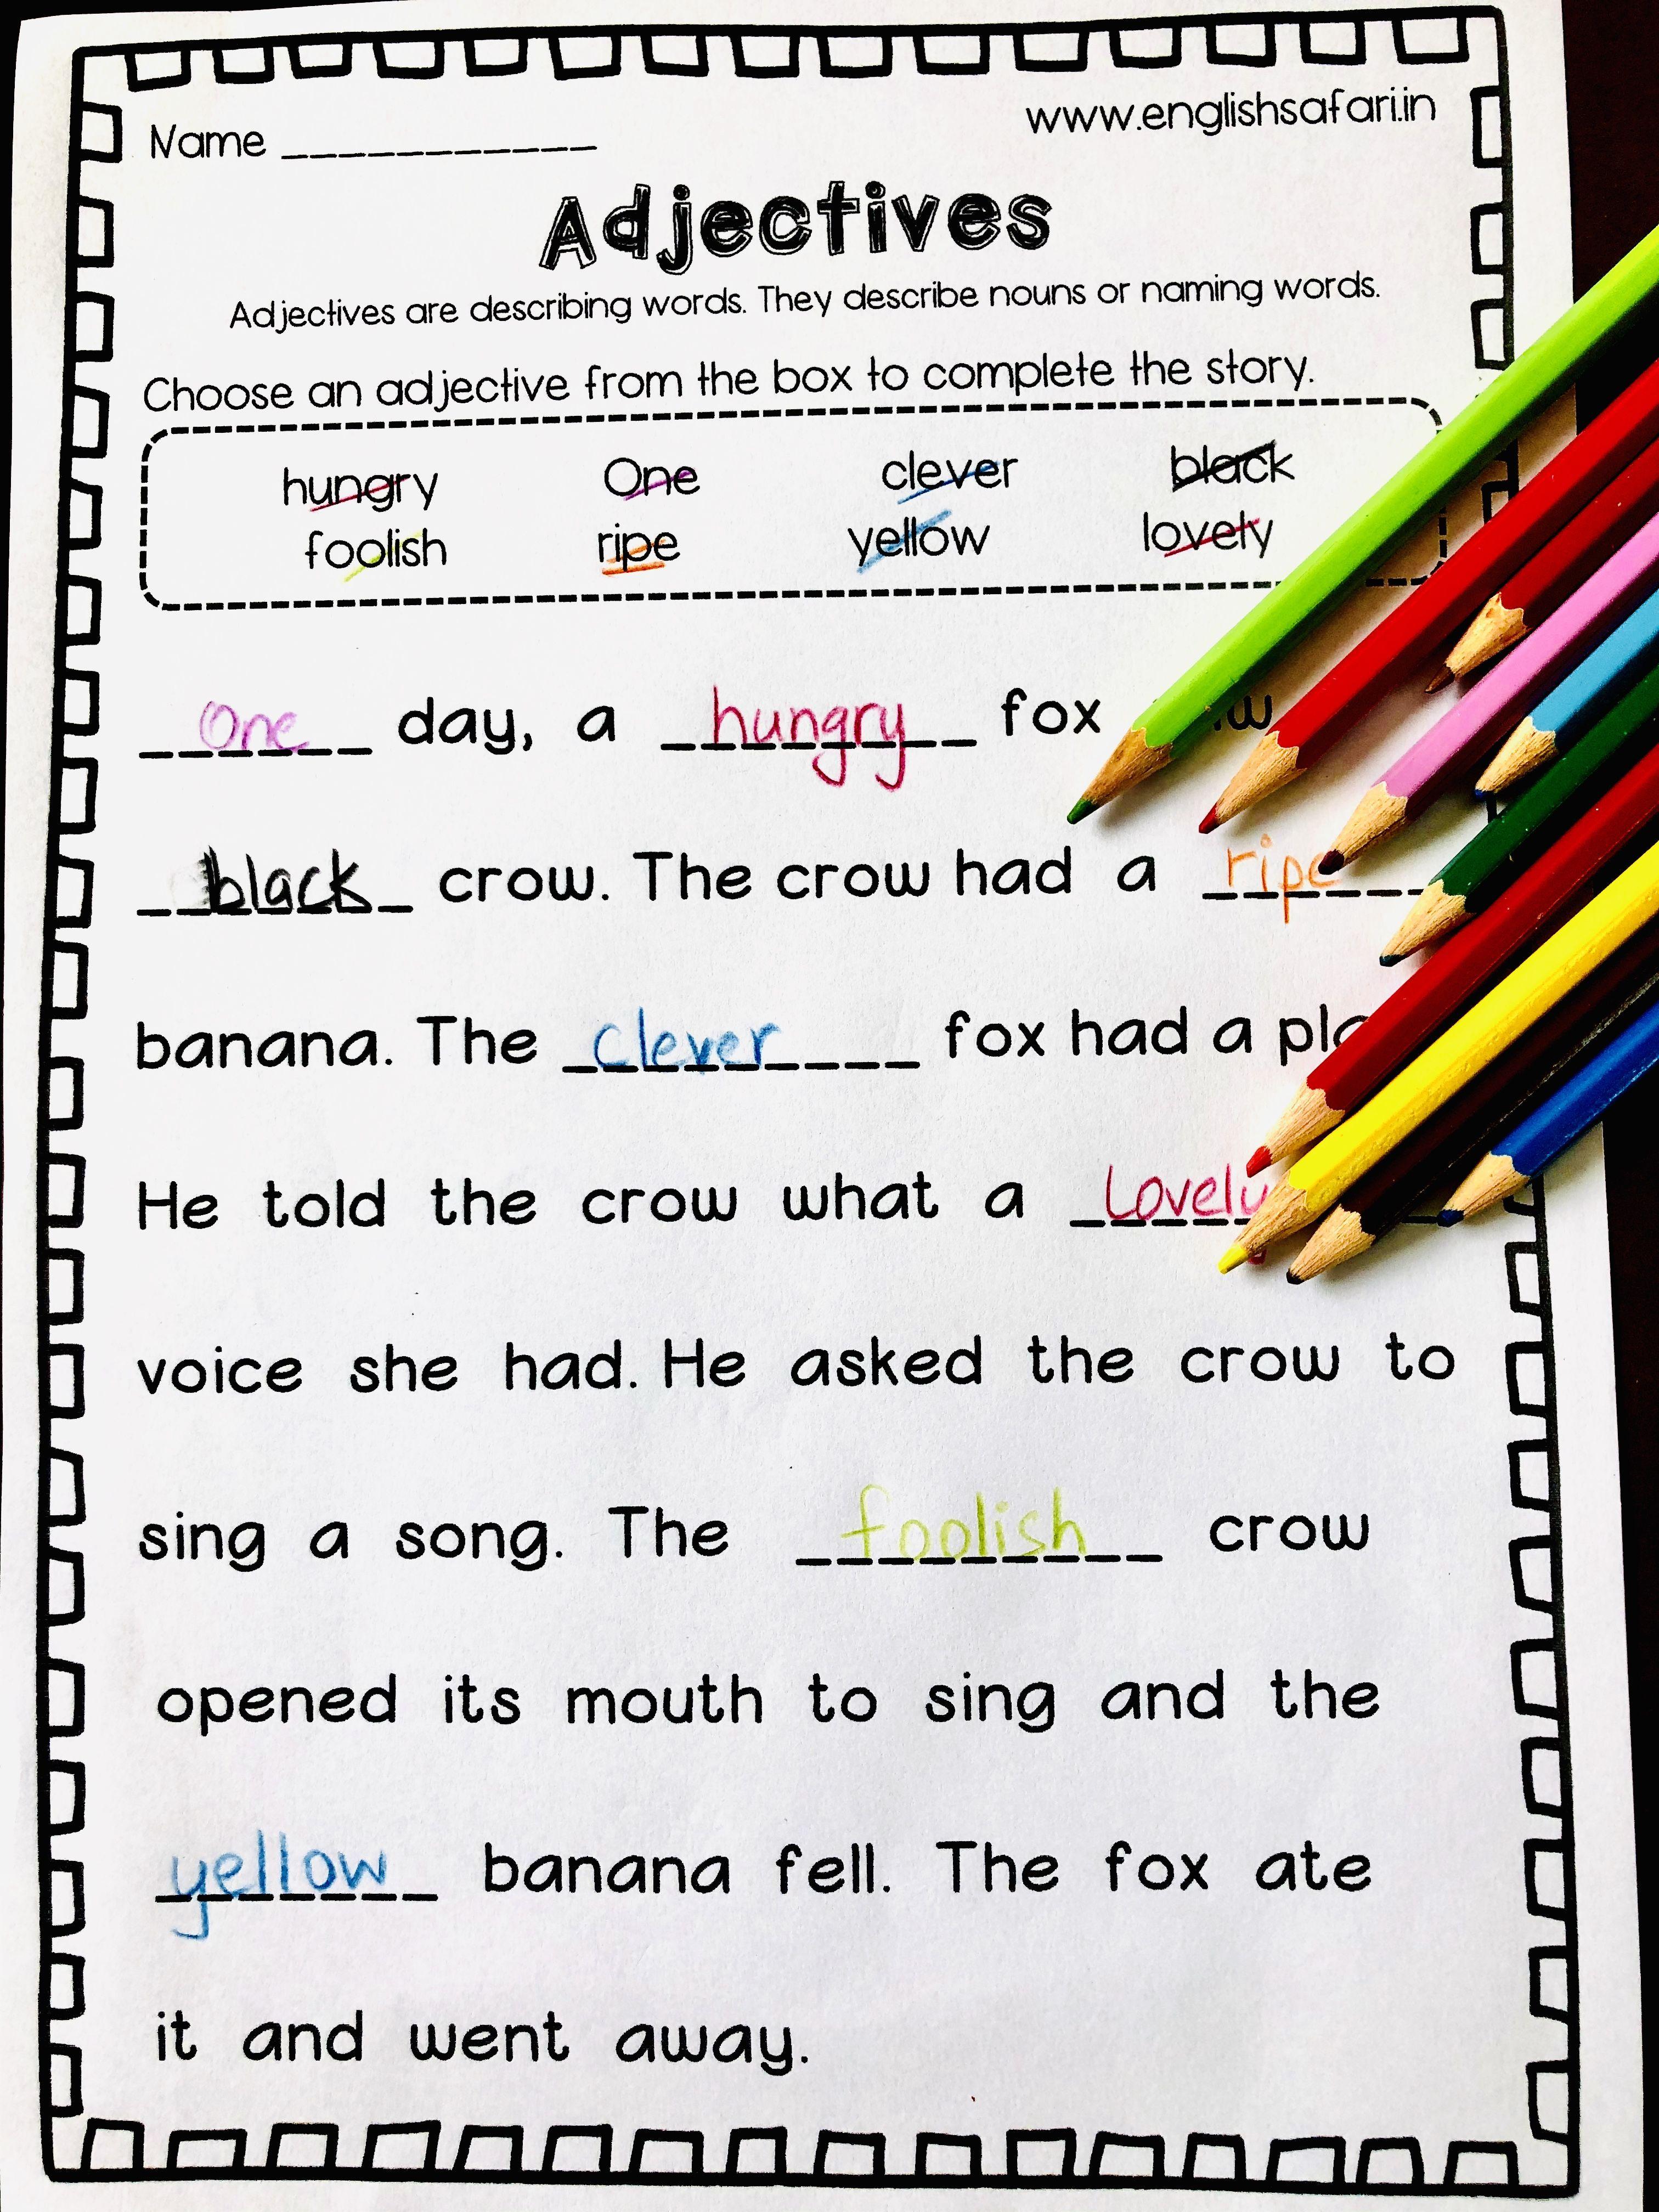 Free Adjectives Complete The Story Englishsafari